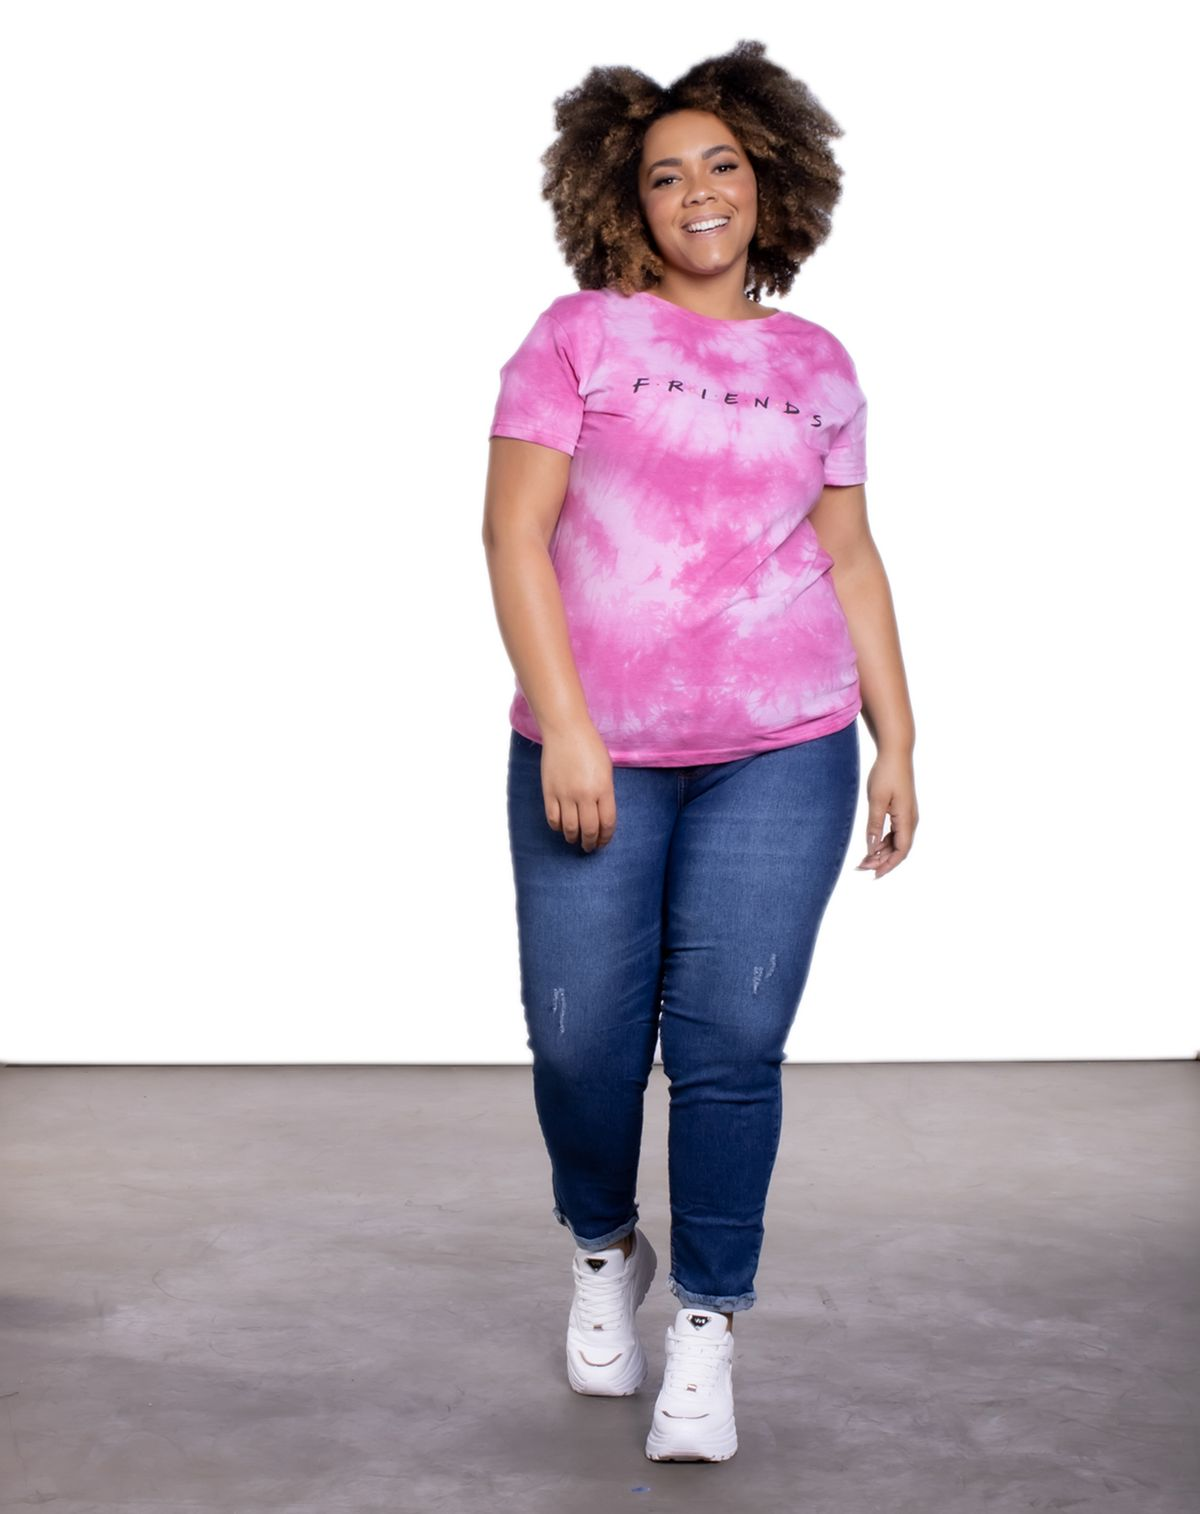 578909001-calca-jeans-plus-feminina-botoes-desfiada-jeans-escuro-46-3f4